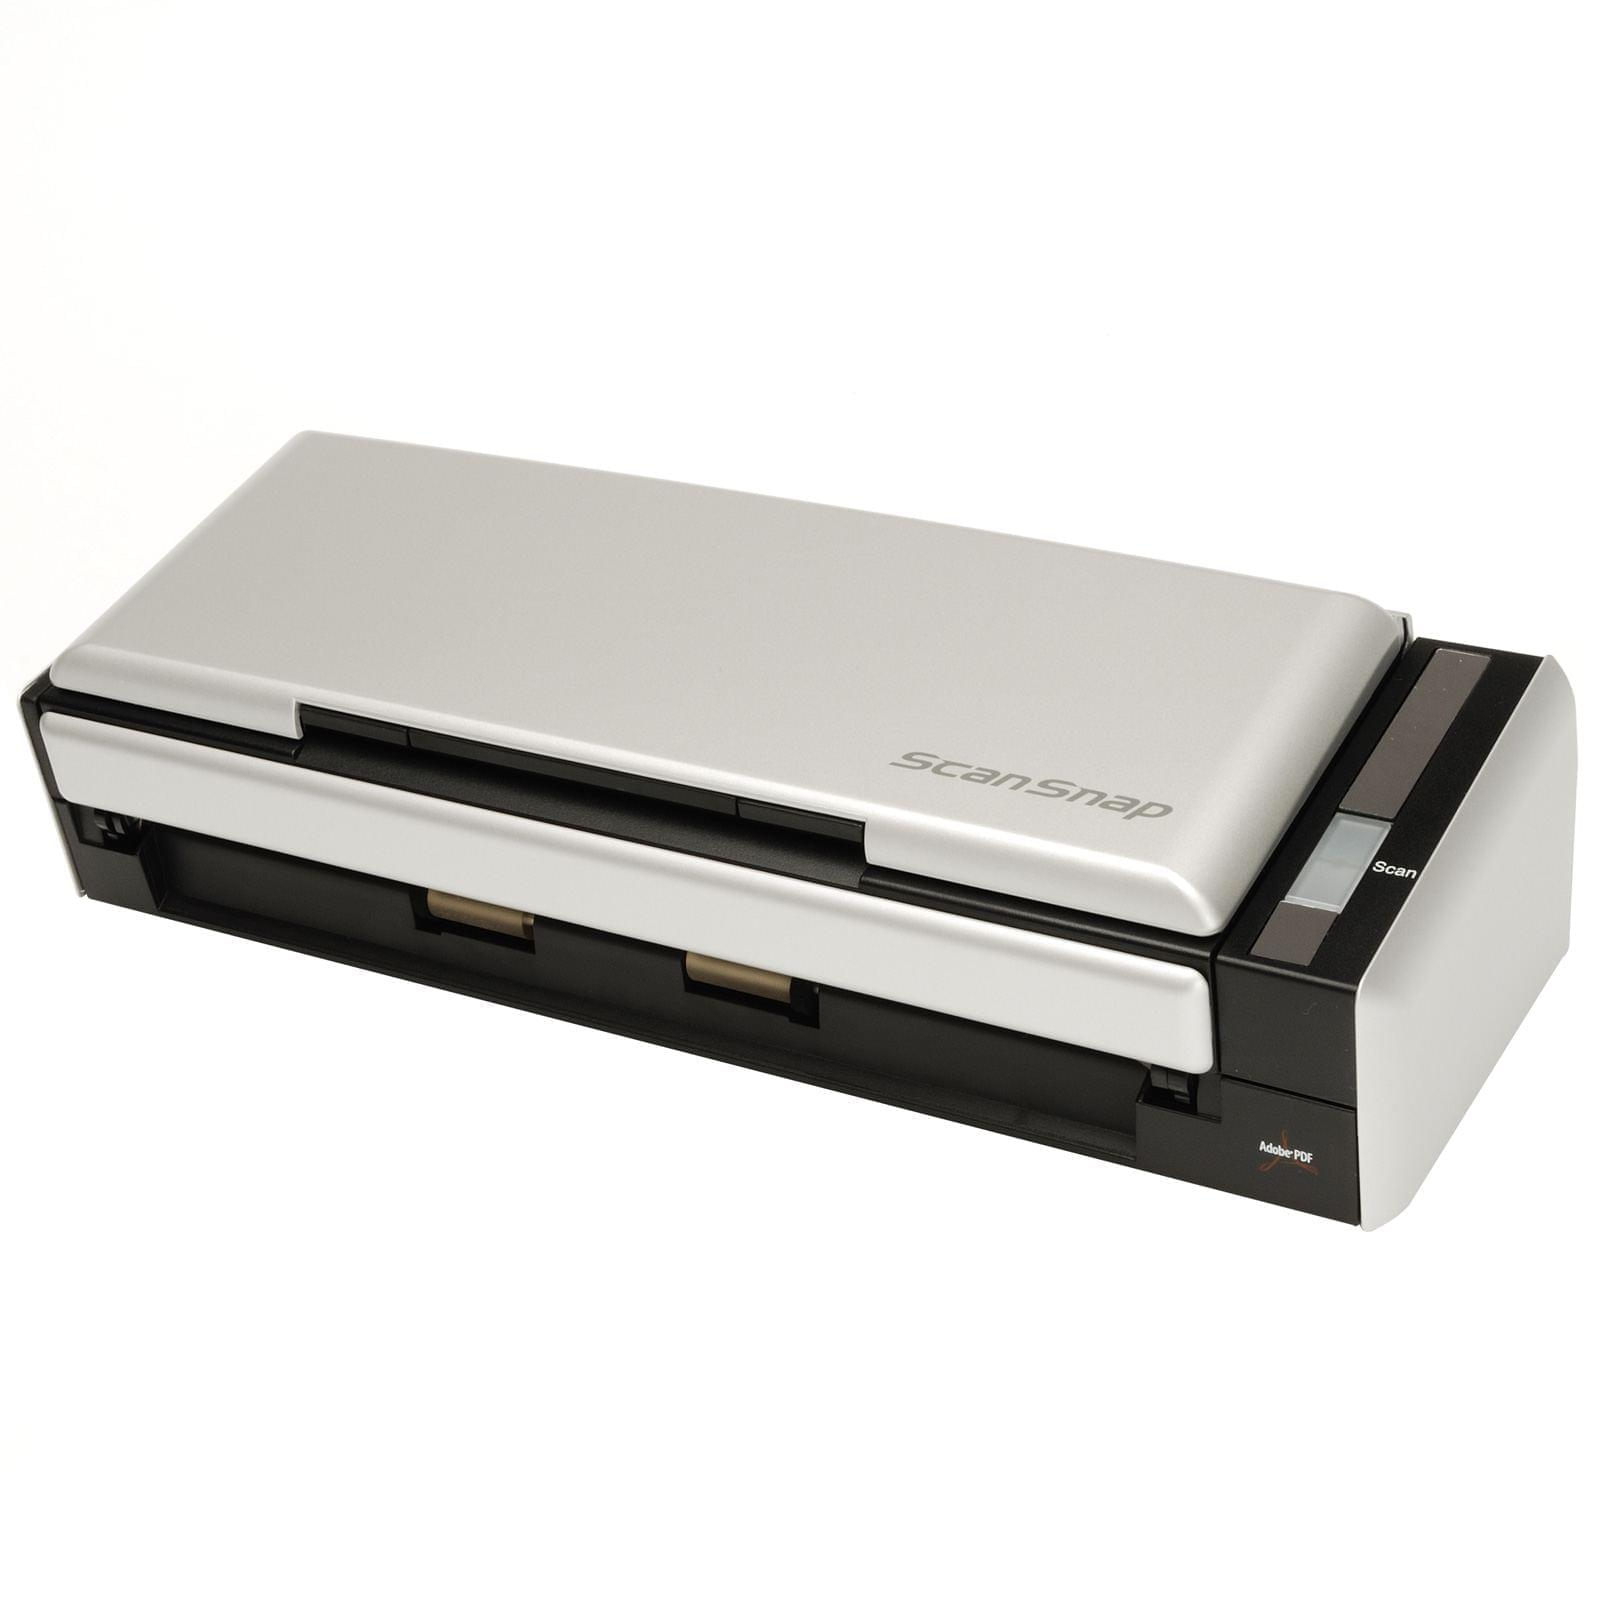 Scanner Fujitsu ScanSnap S1300 résolution 600x600 - 0